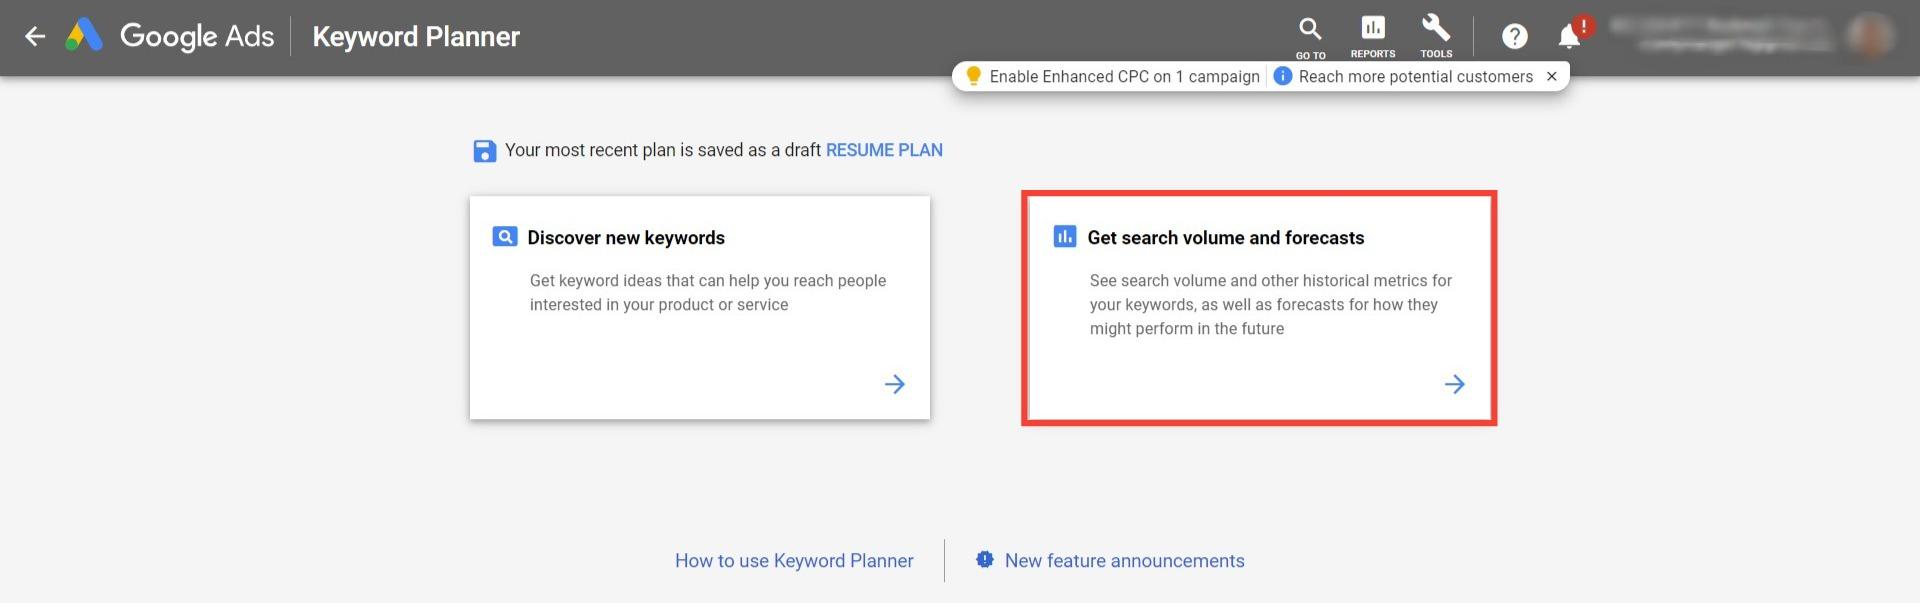 Keyword Planner - Bookmark Your Life Inc. - Google Ads